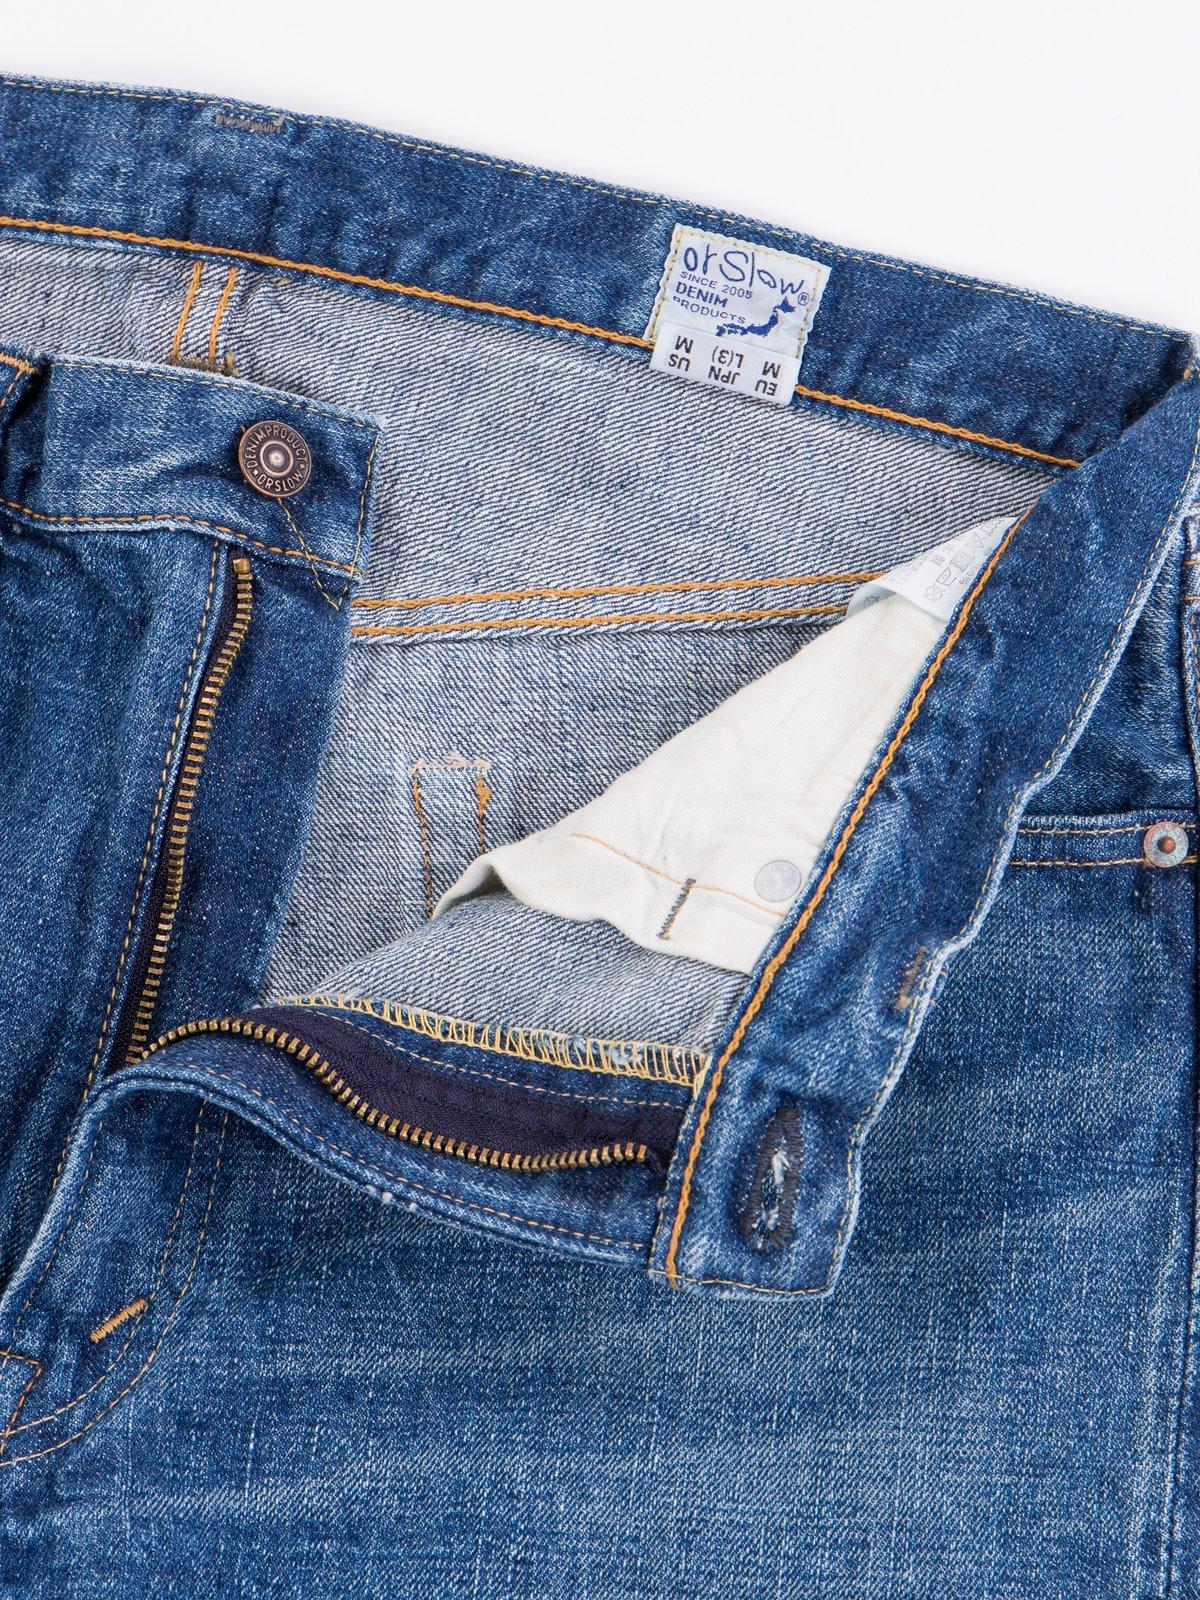 2 Year Wash 107 Slim Fit Jean - Image 6